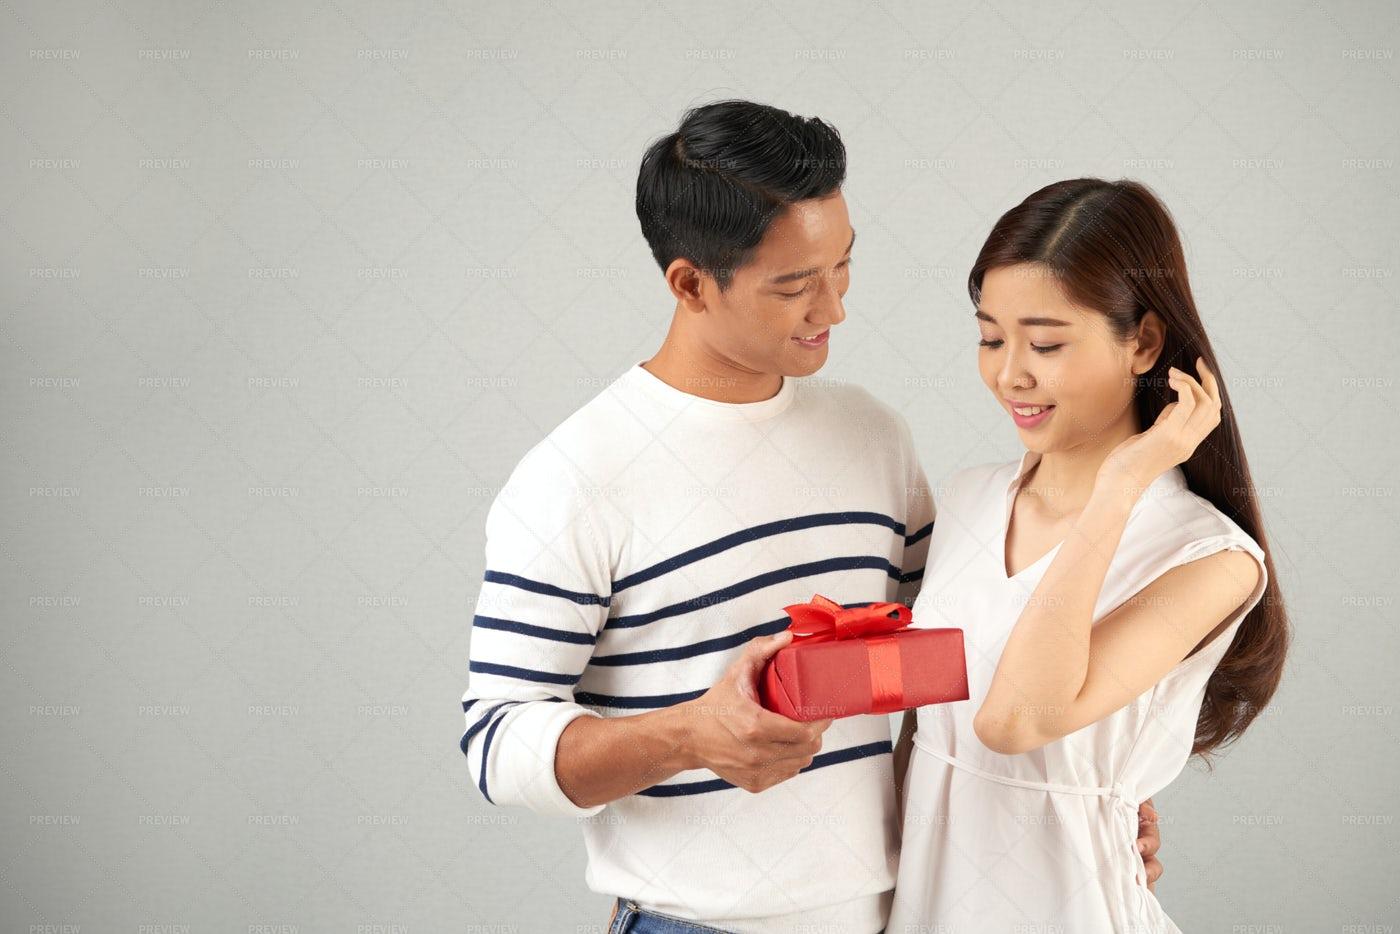 Valentine Gift For Girlfriend: Stock Photos